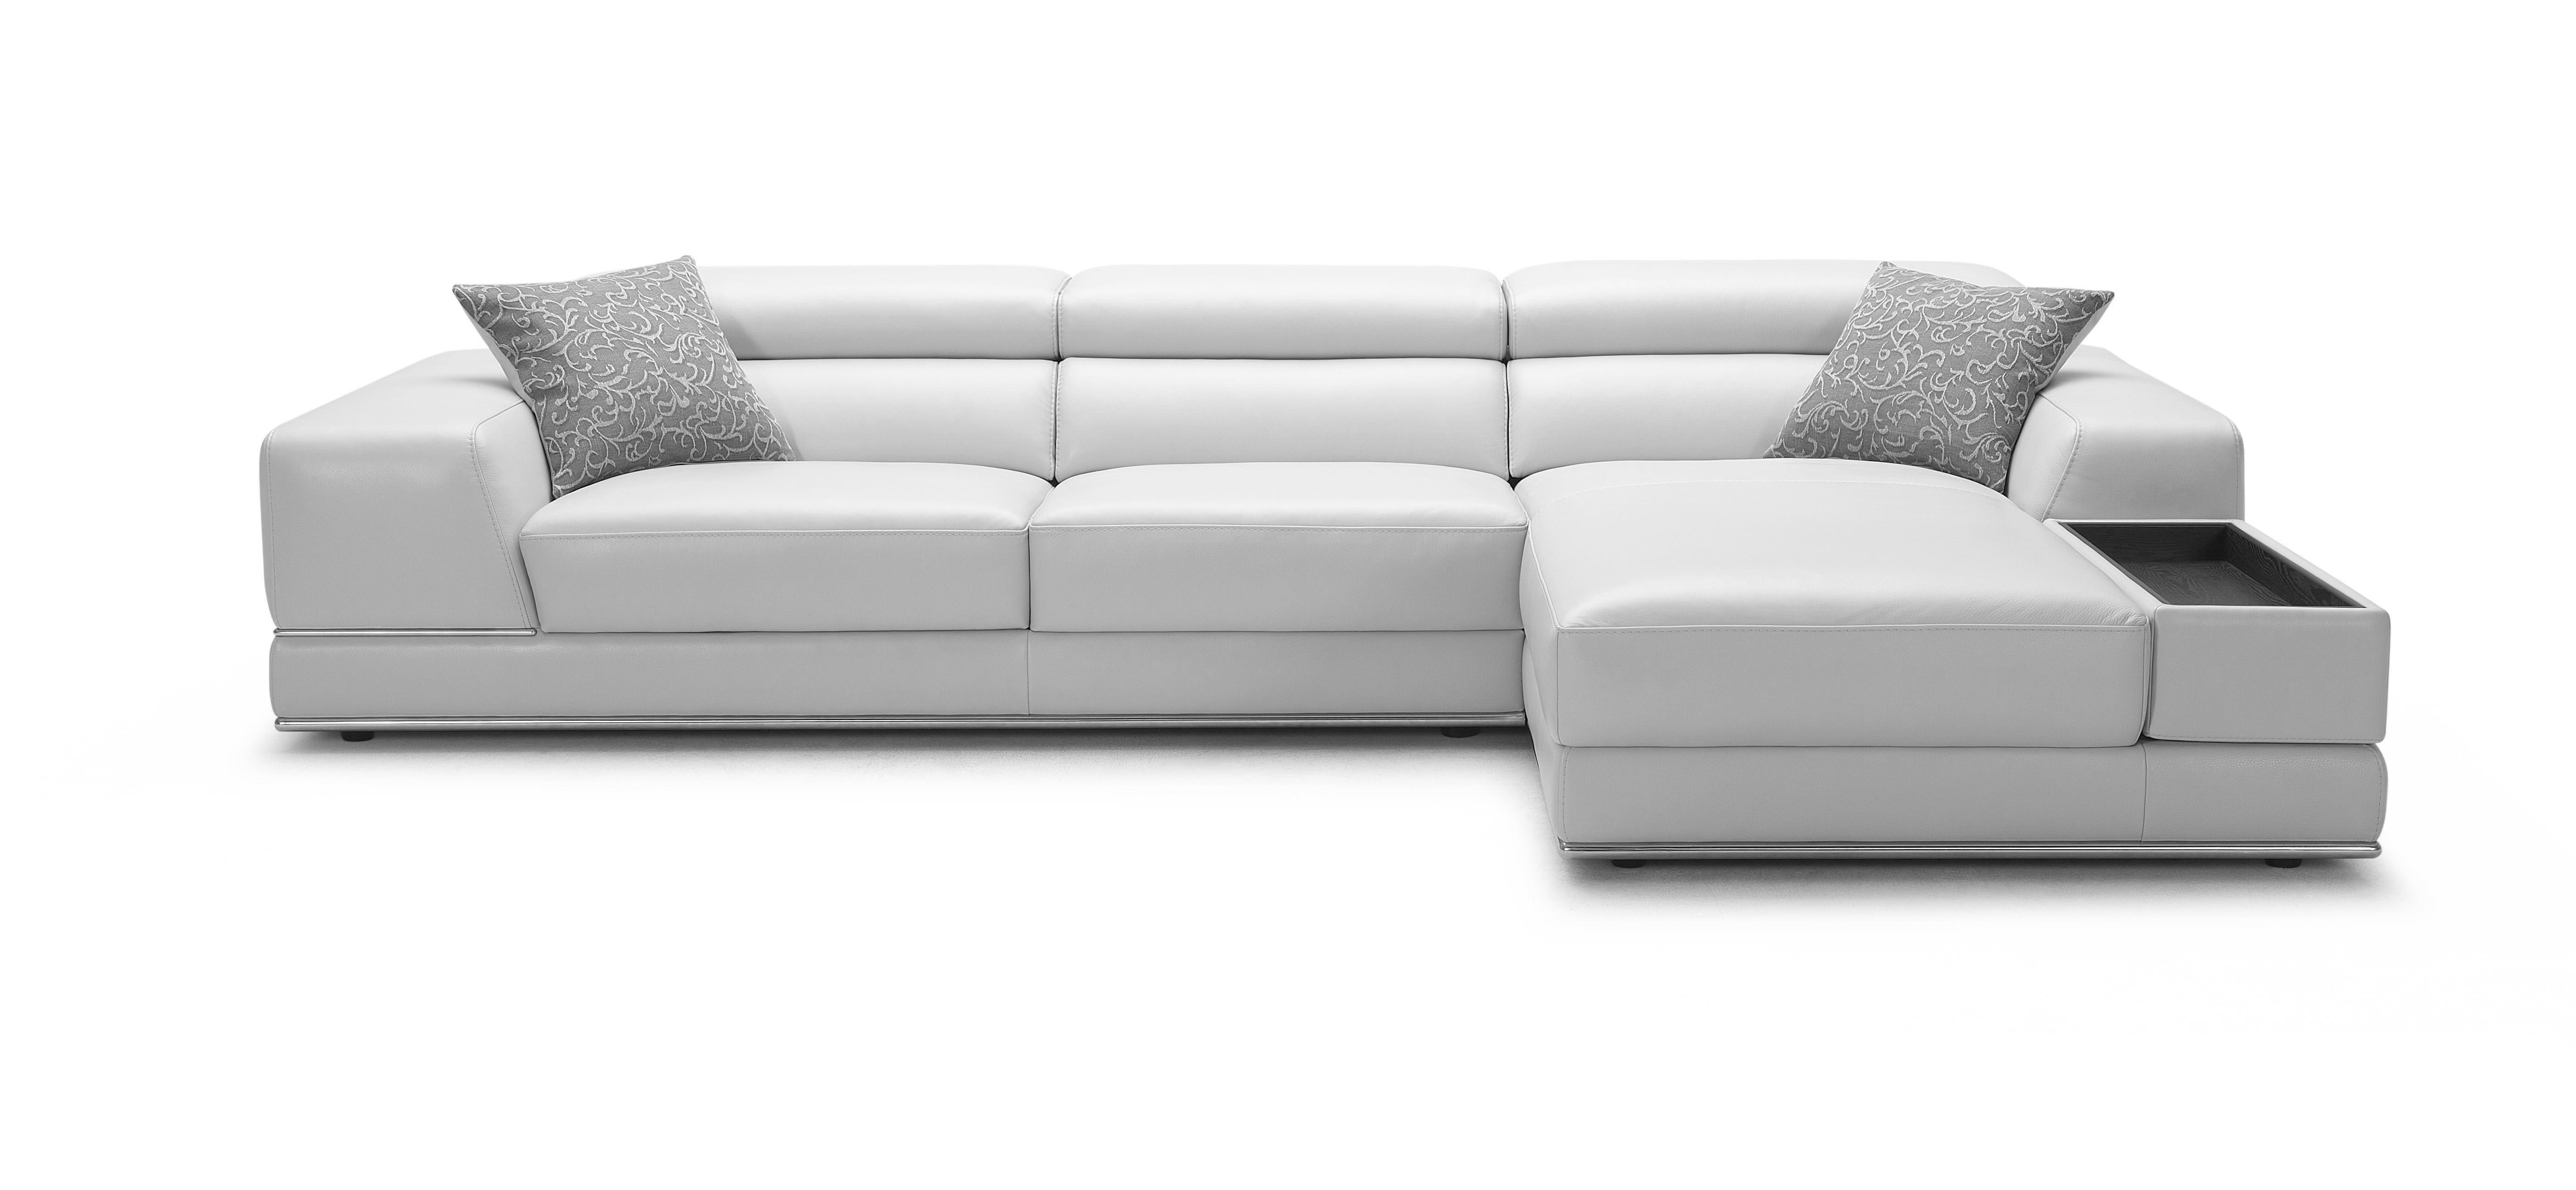 bergamo sectional leather modern sofa gray poundex bobkona ottoman unique everett wa sofas